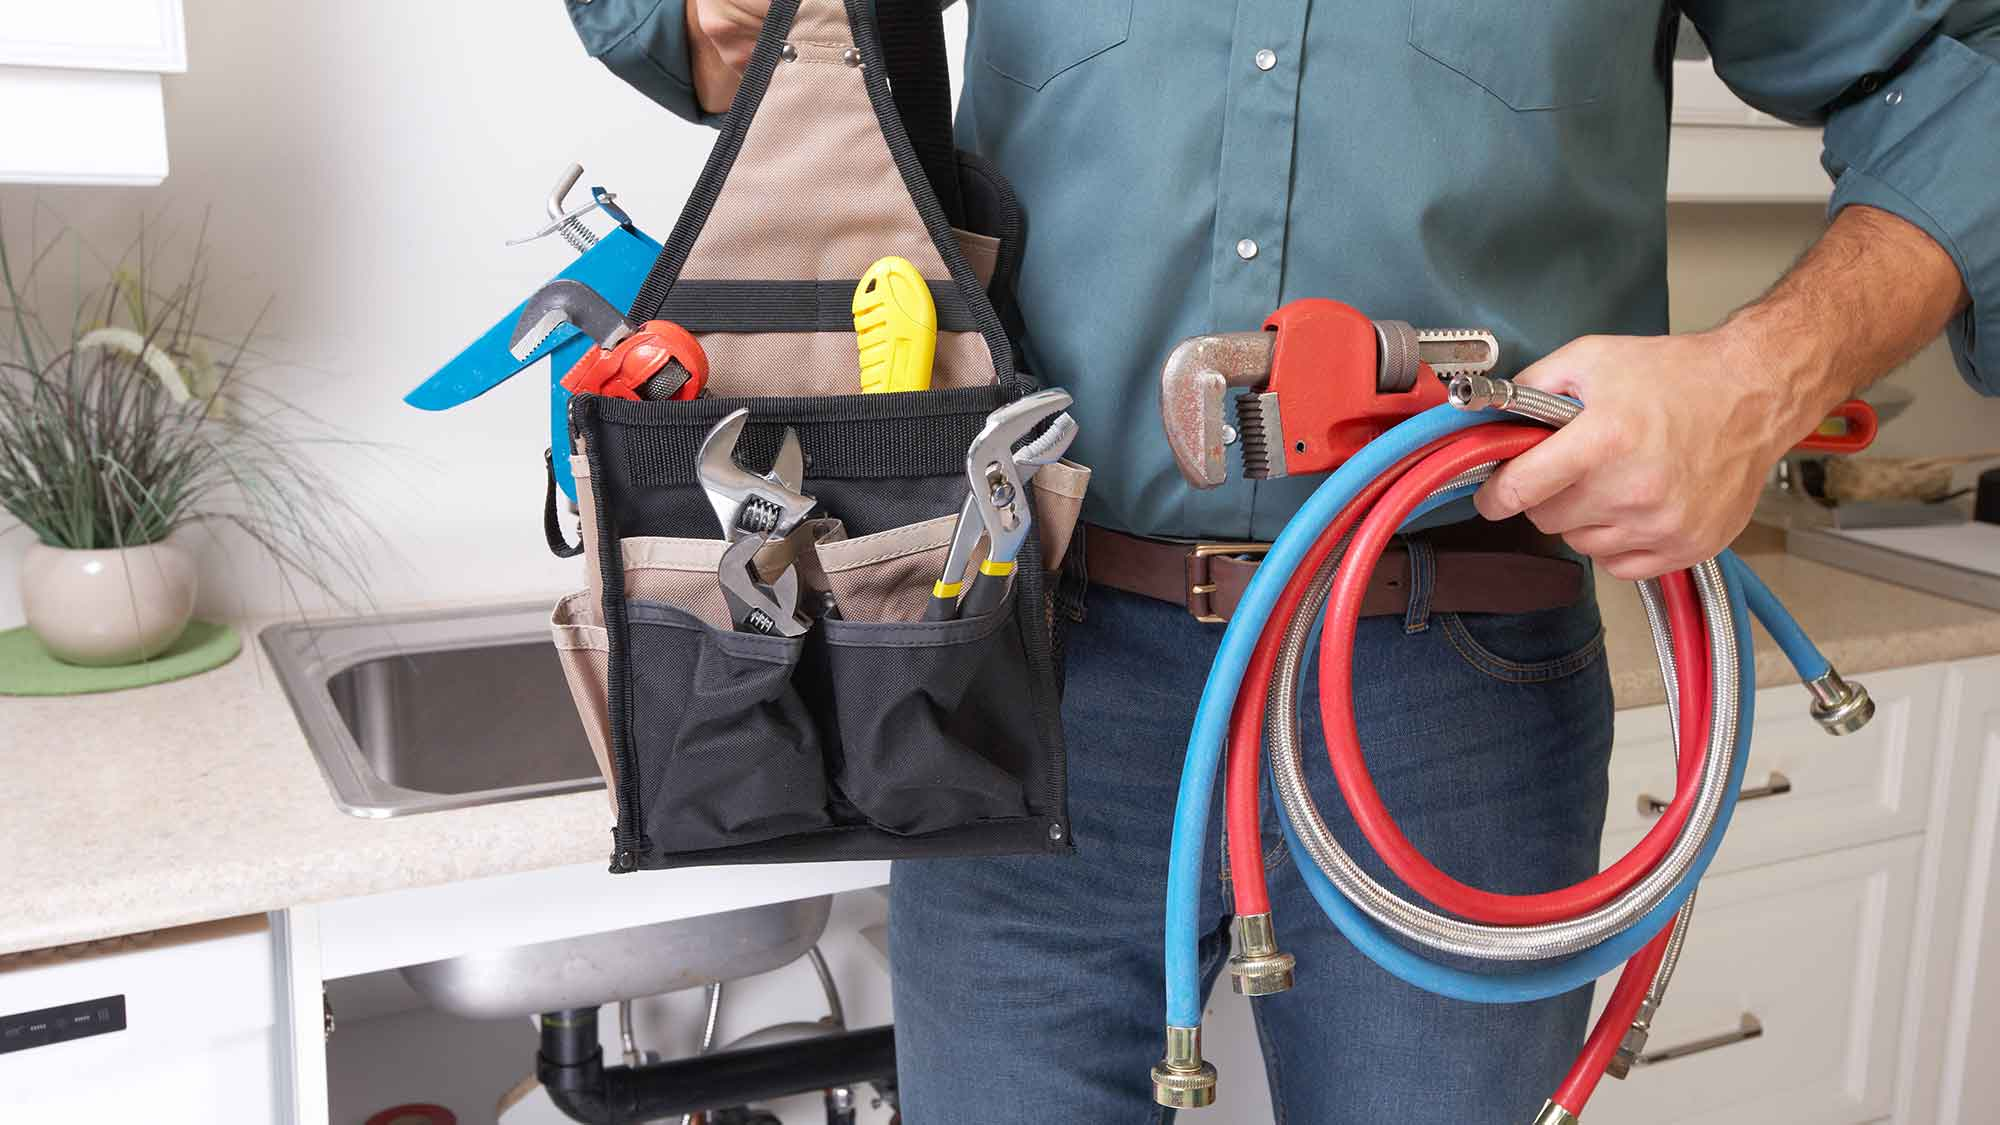 boiler servicing essex maintenance leigh on sea engineer